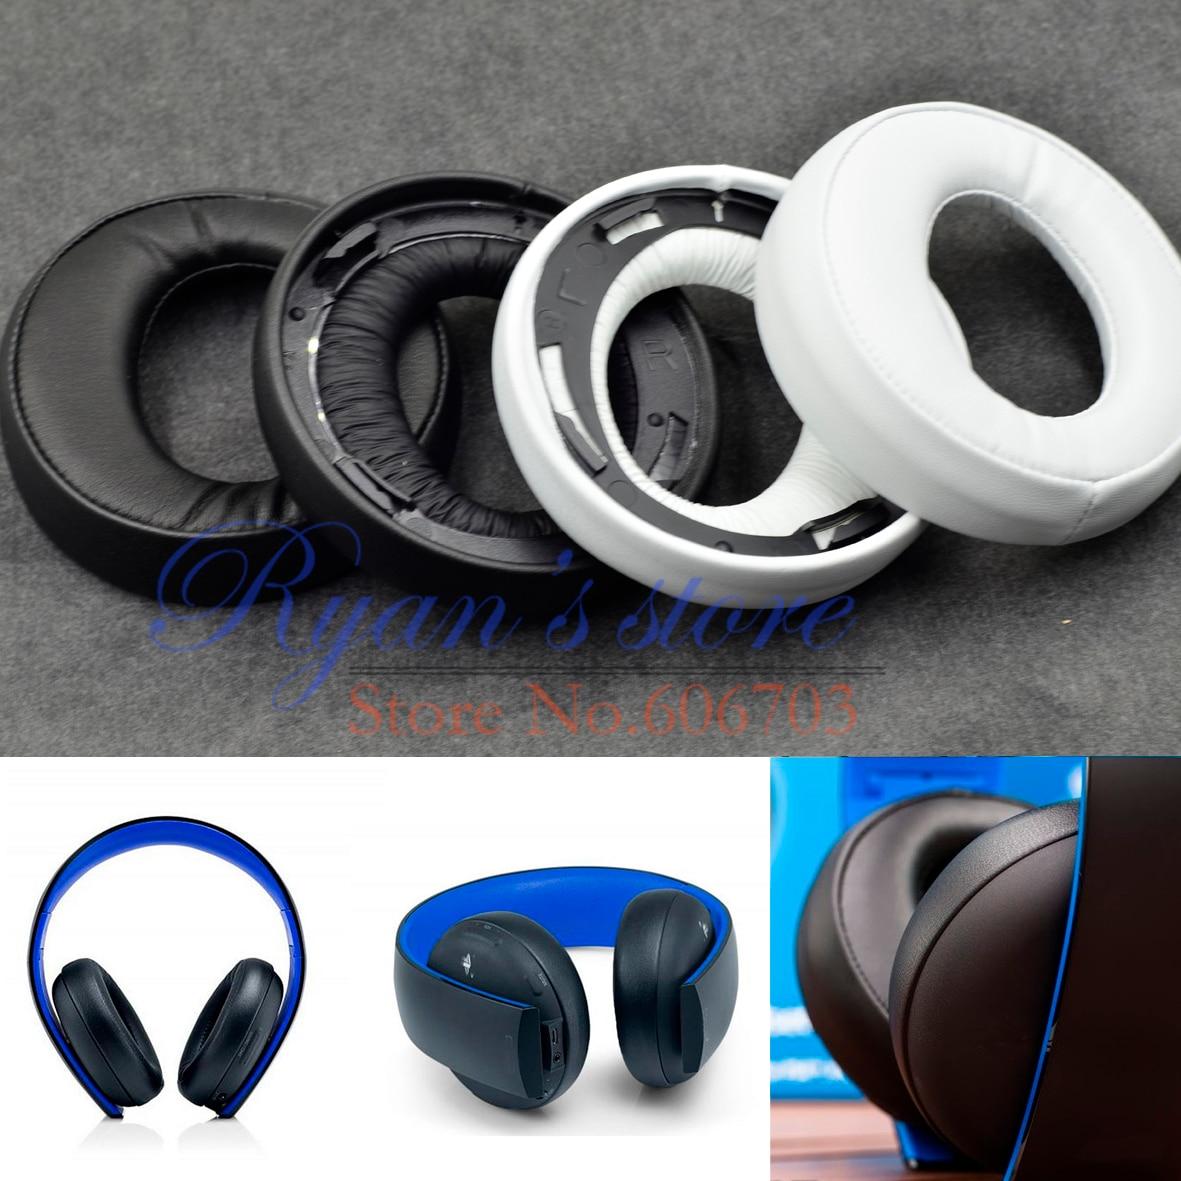 Headphone sony wireless bluetooth - sony wireless headphones ps4 gold